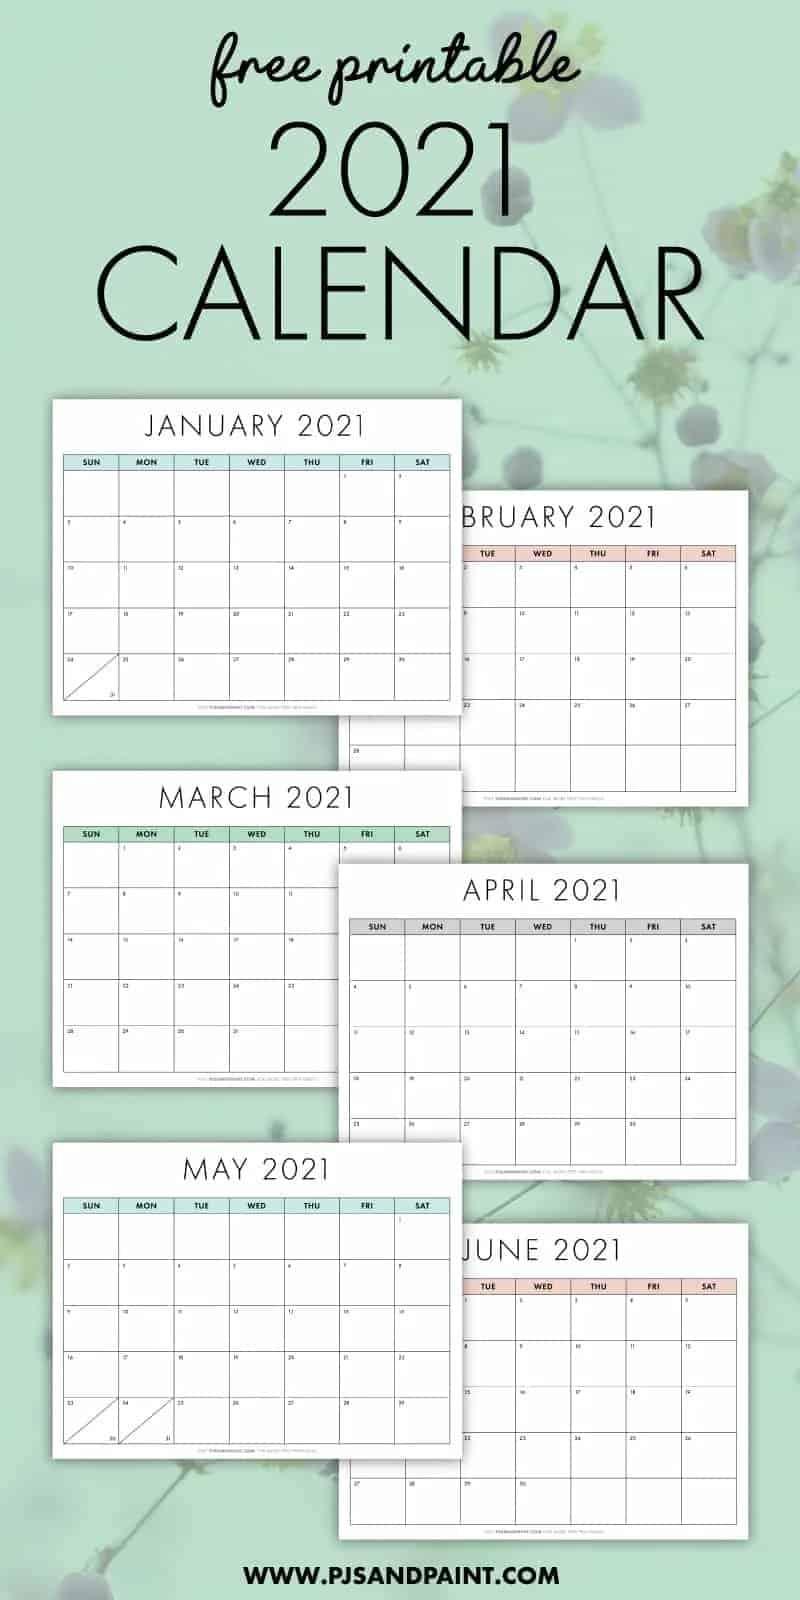 2021 printable calendar pjs and paint